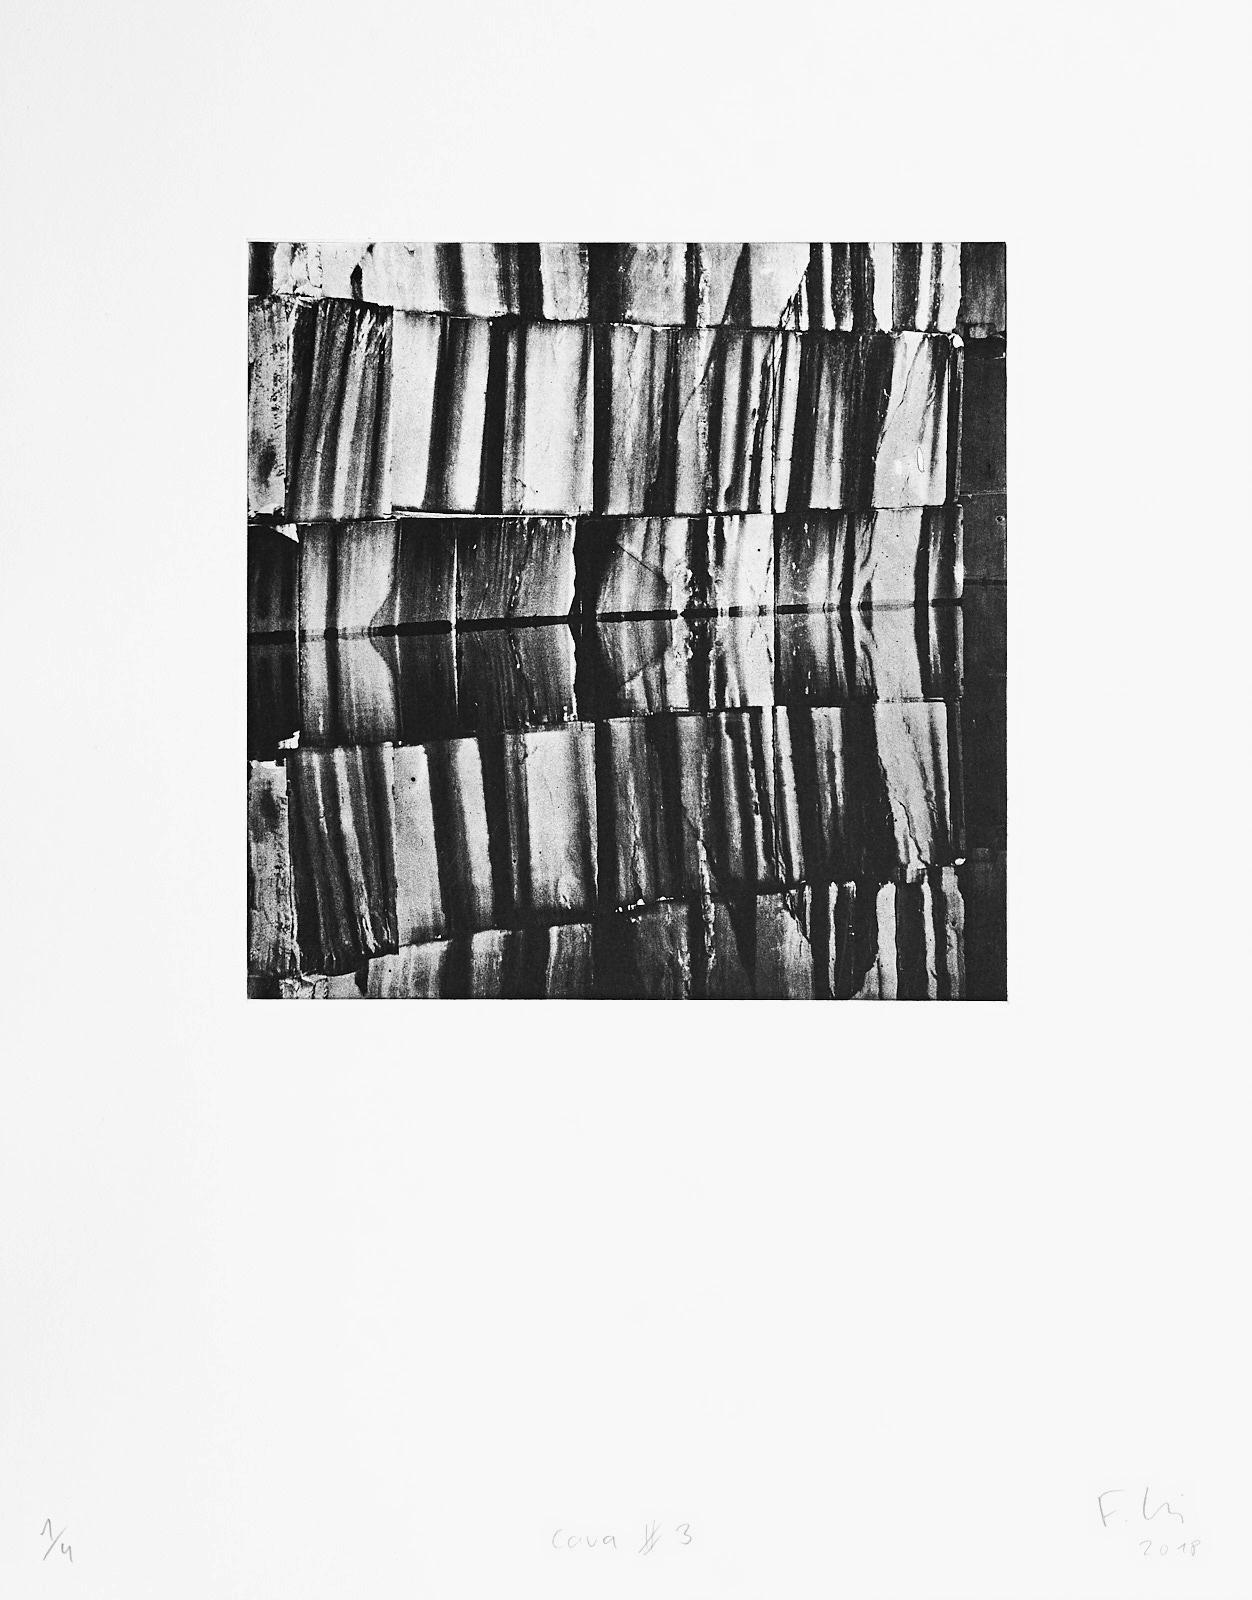 Cava #3 (2018)  medium: Photogravure  size: 36 x 46 cm  paper: Zerkall 270 g/qm  plate: 21.5 x 21.5 cm  edition: 7 copies  numbered: 1/4 - 4/4, 3 e.a.  printer: FWU